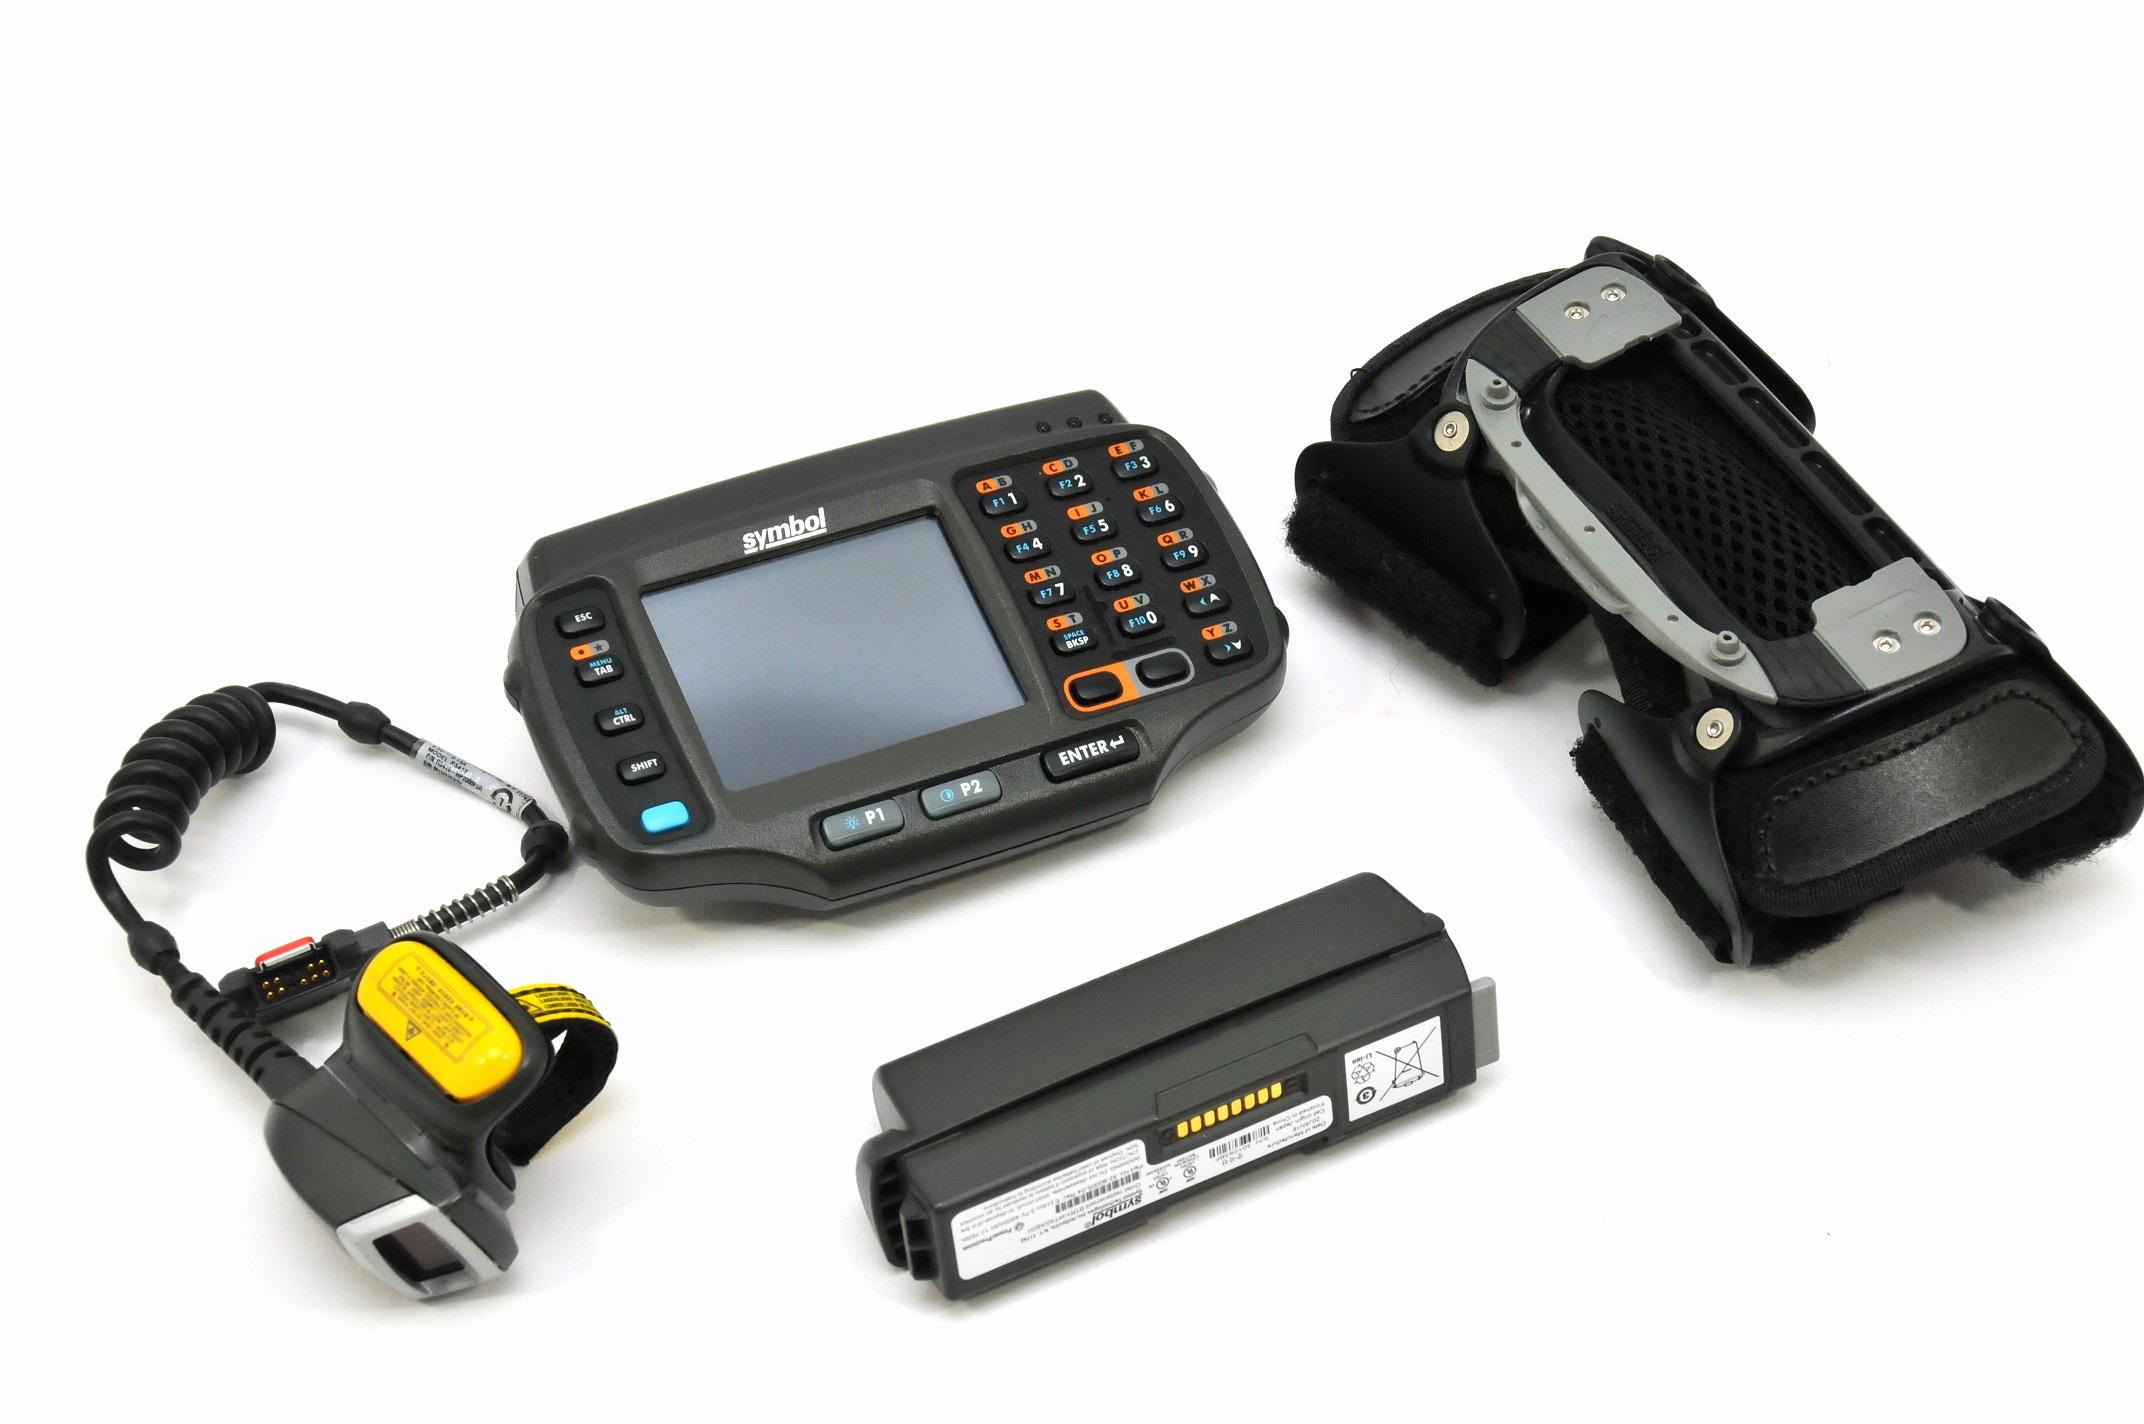 motorola-symbol-barcode-scanners-for-sale